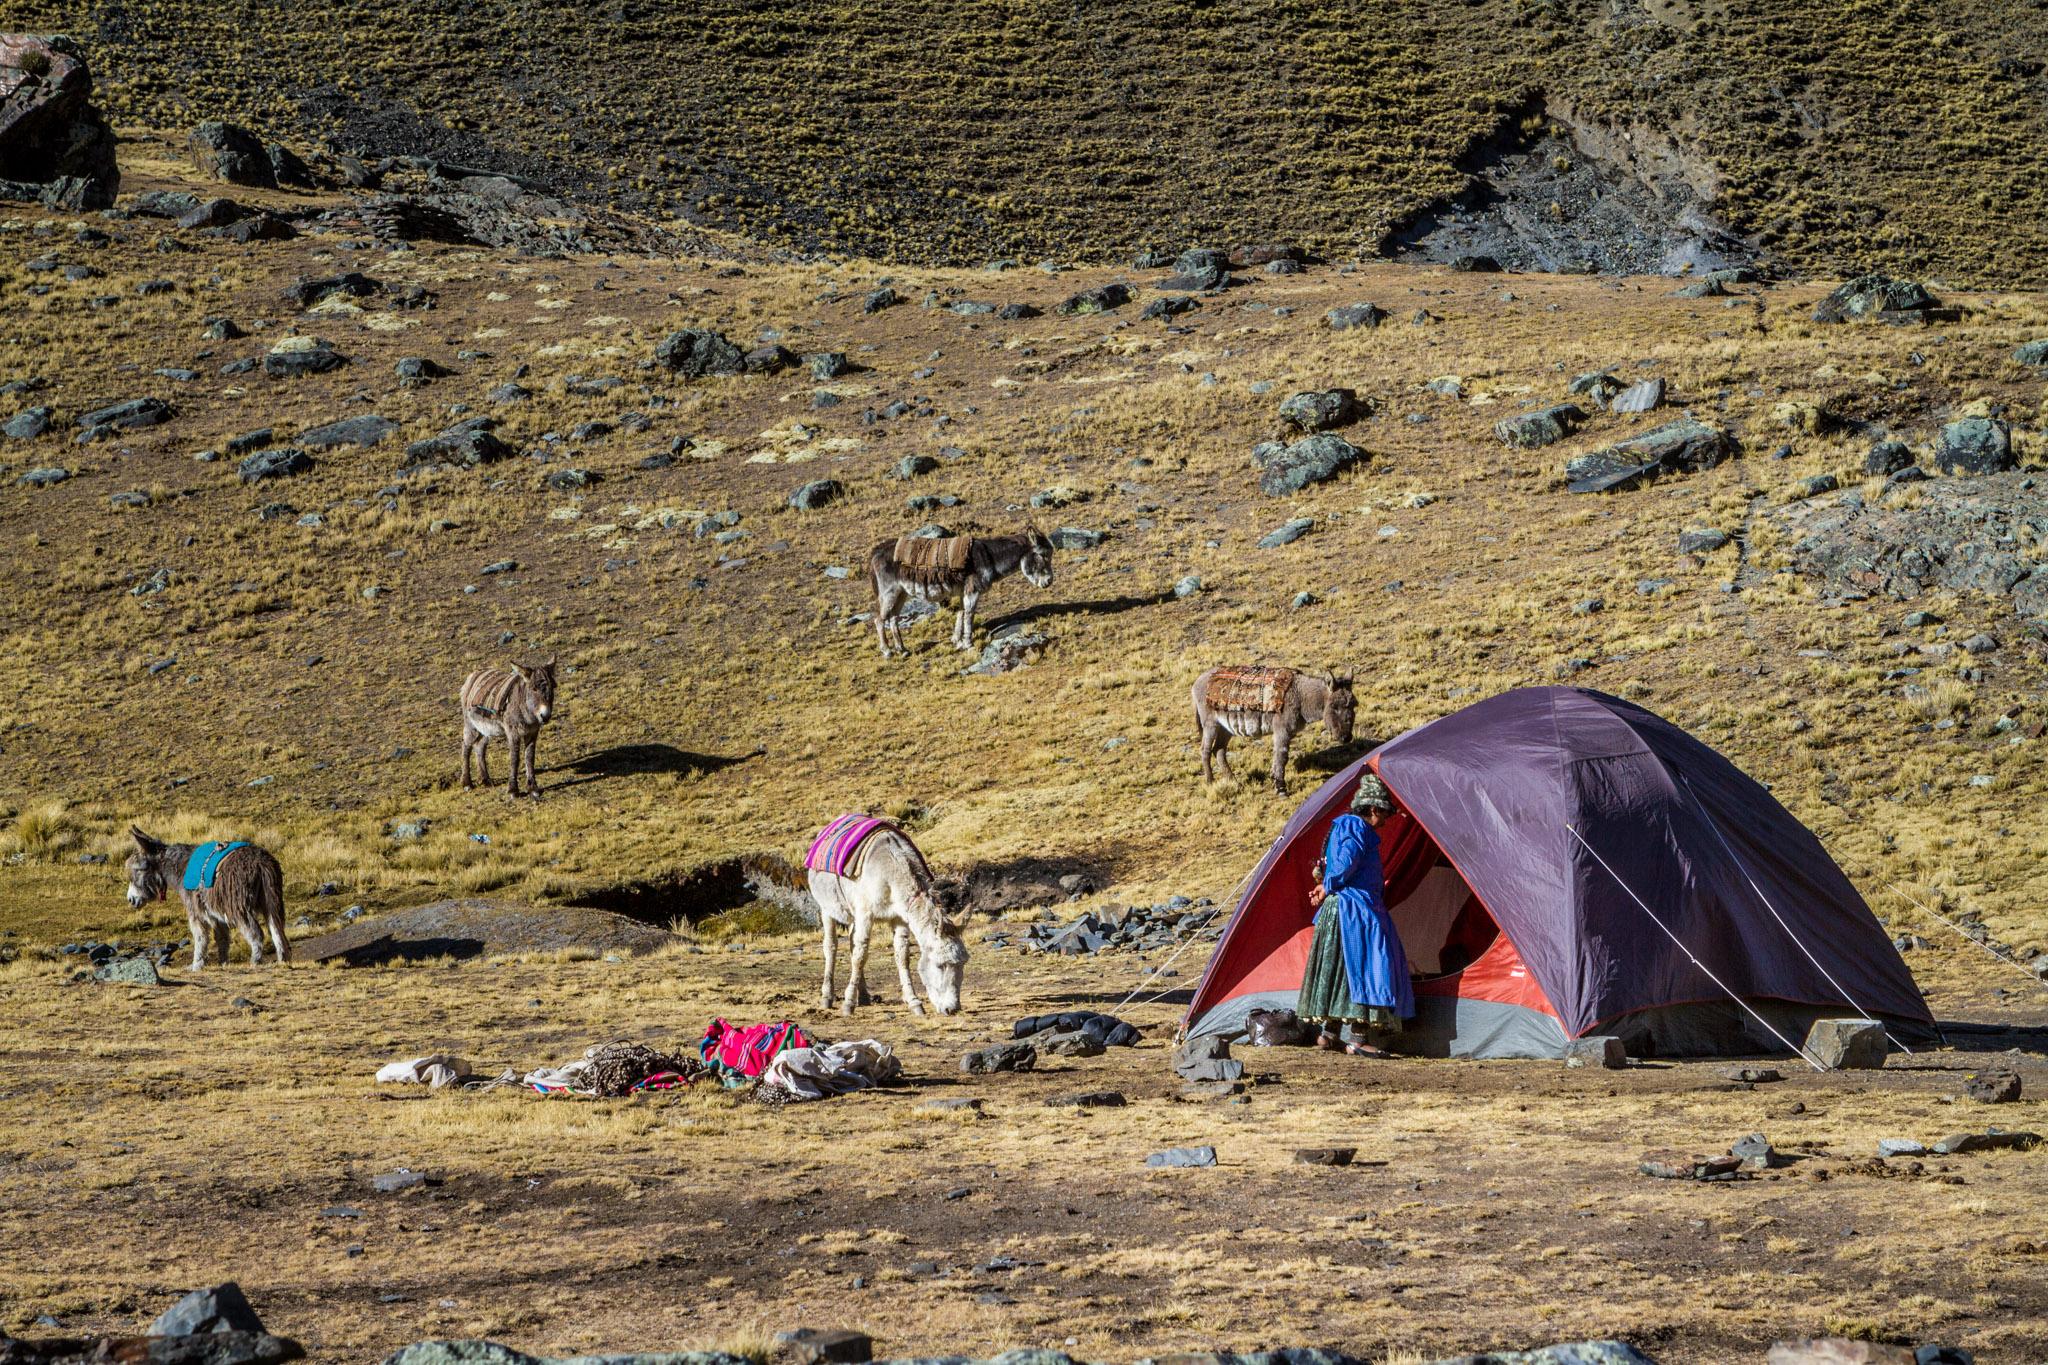 Ali-Barqawi-Studios-Explore-Series-Travel-Adventure-Documentary-C4CGAZA-Bolivia-Mount-Tarija-2015-226.jpg